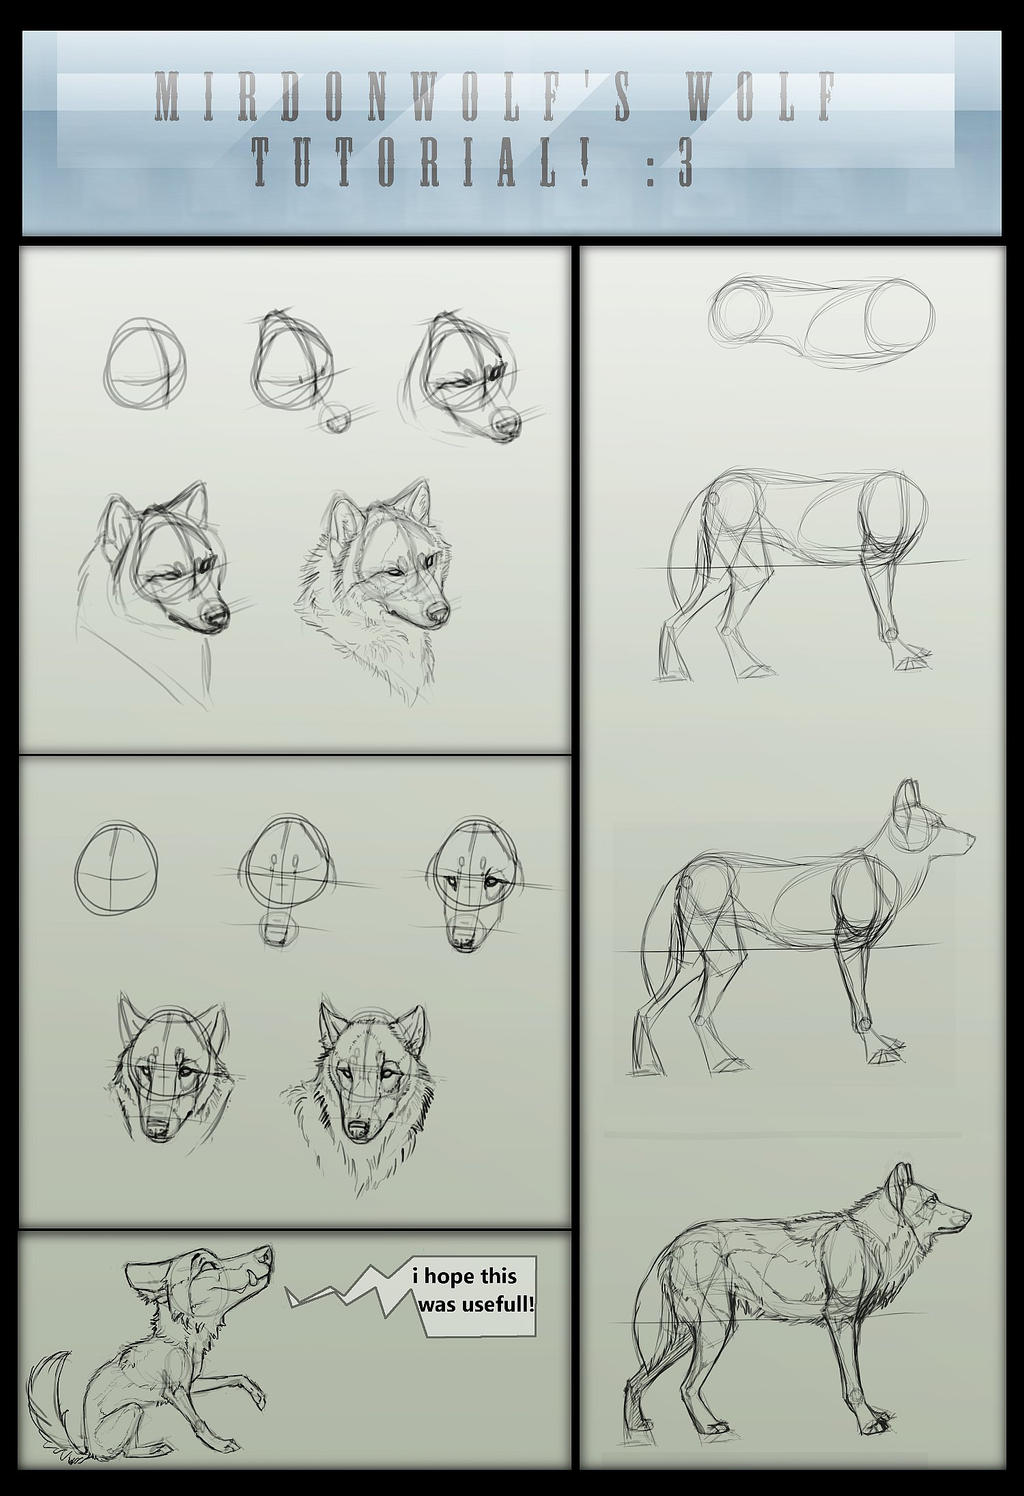 http://fc06.deviantart.net/fs70/i/2013/357/a/c/mirdonwolf_s_basic_wolf_tutorial_by_mirdon_wolf-d4lzq07.jpg